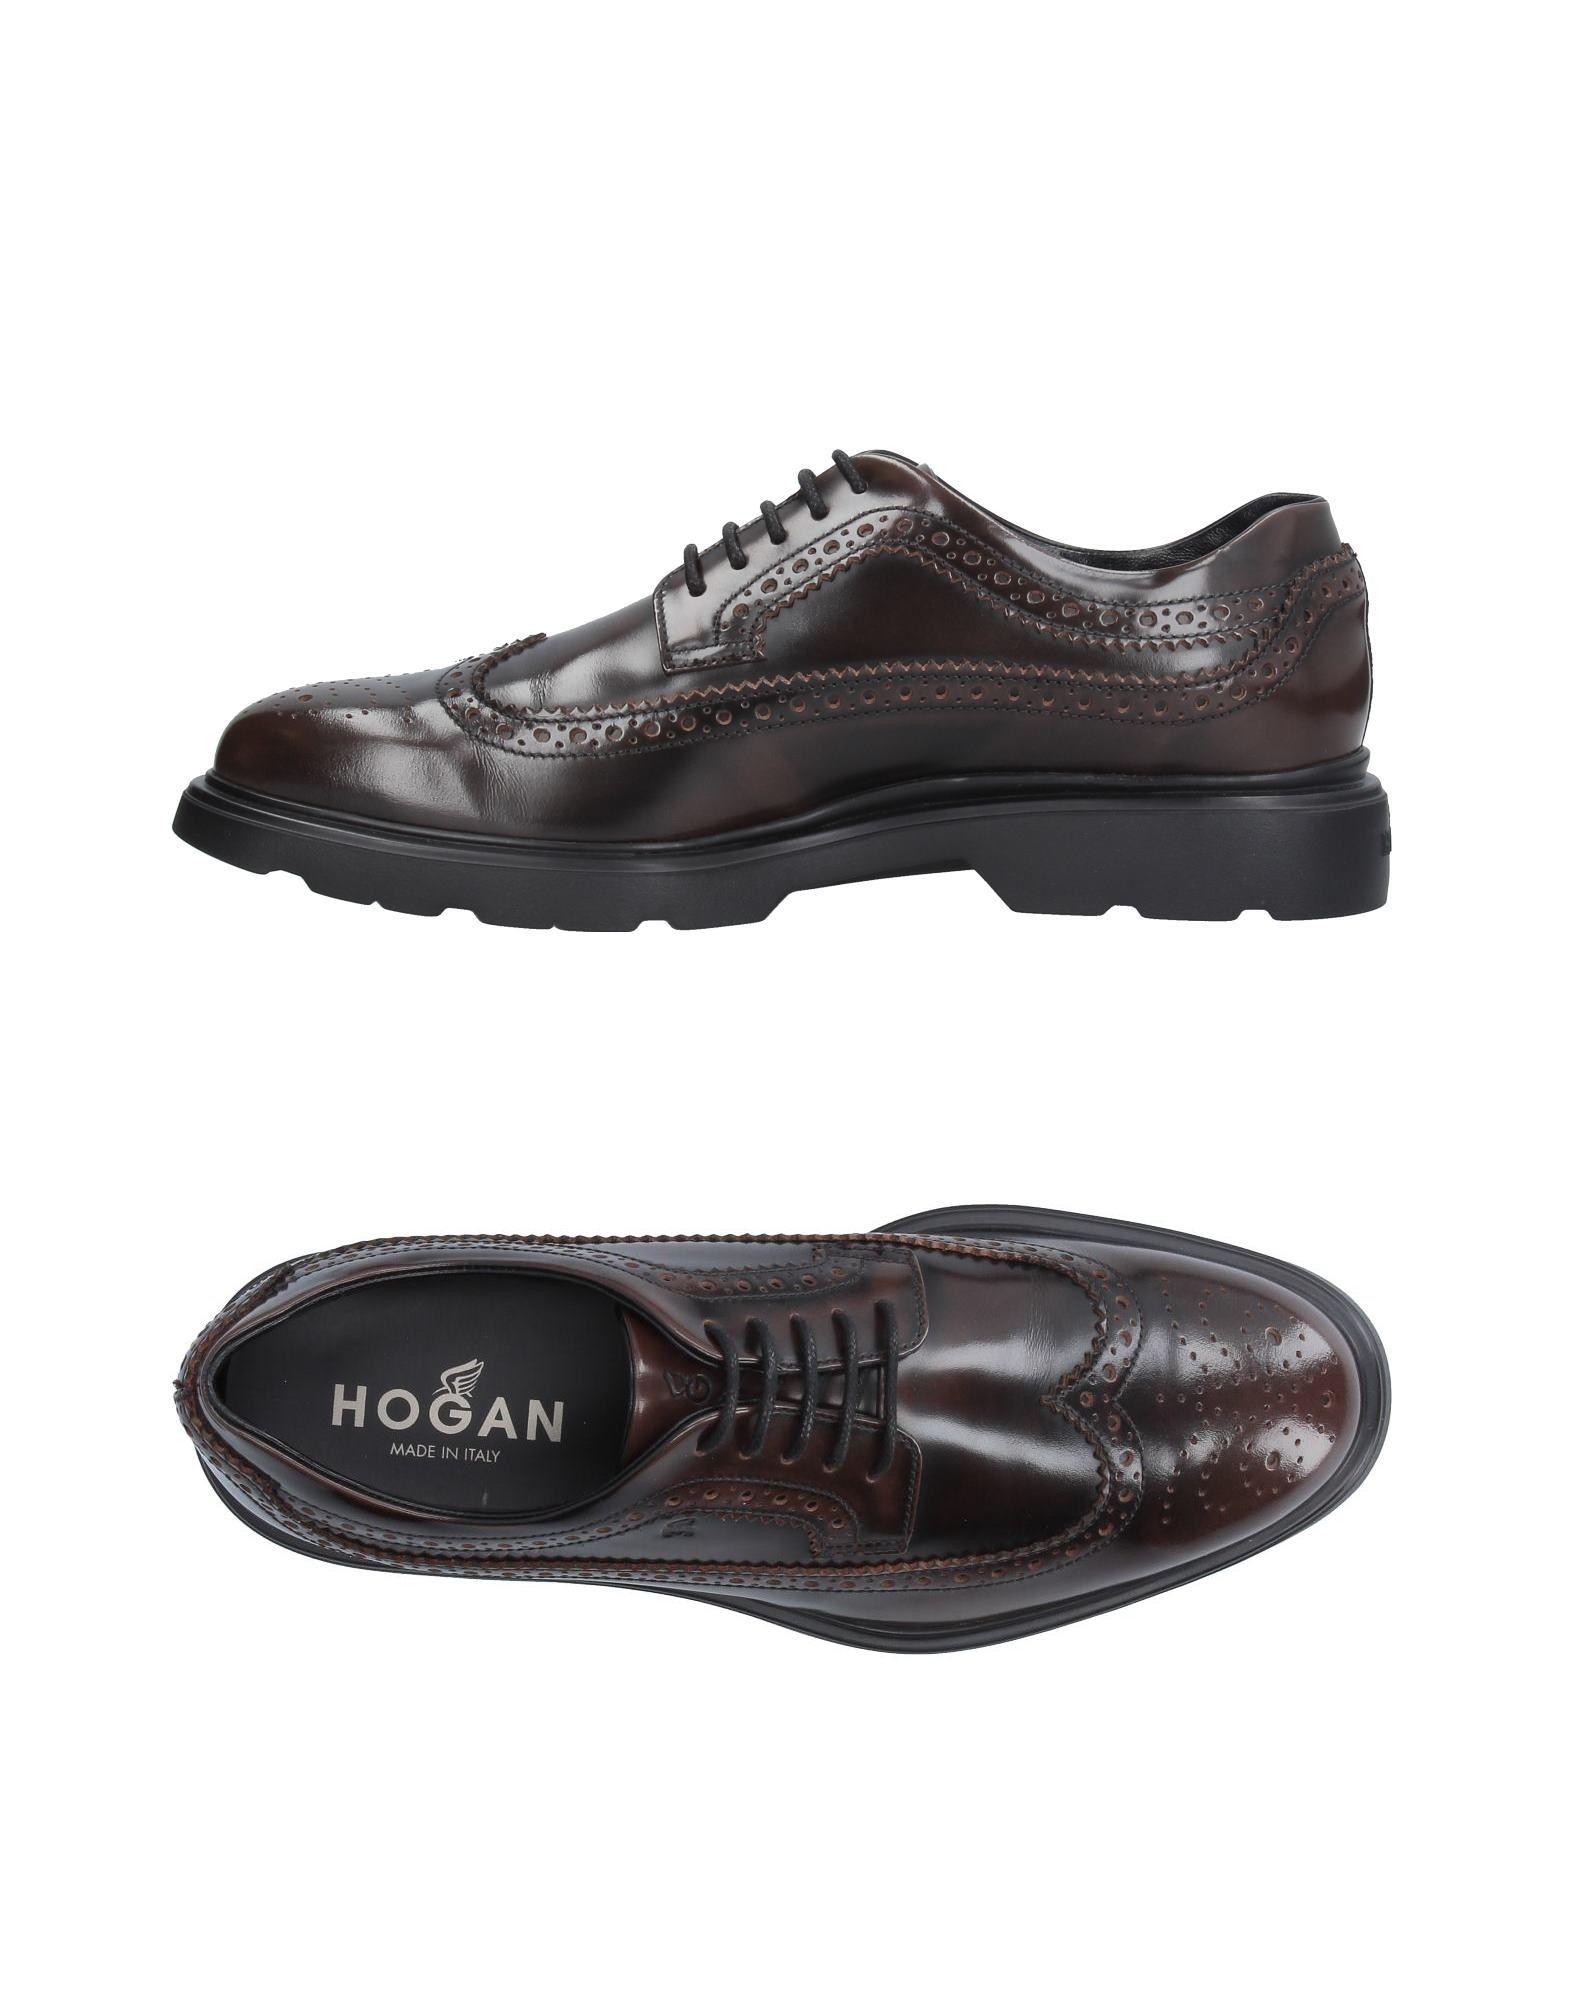 Moda Stringate Hogan Uomo - 11229140AJ